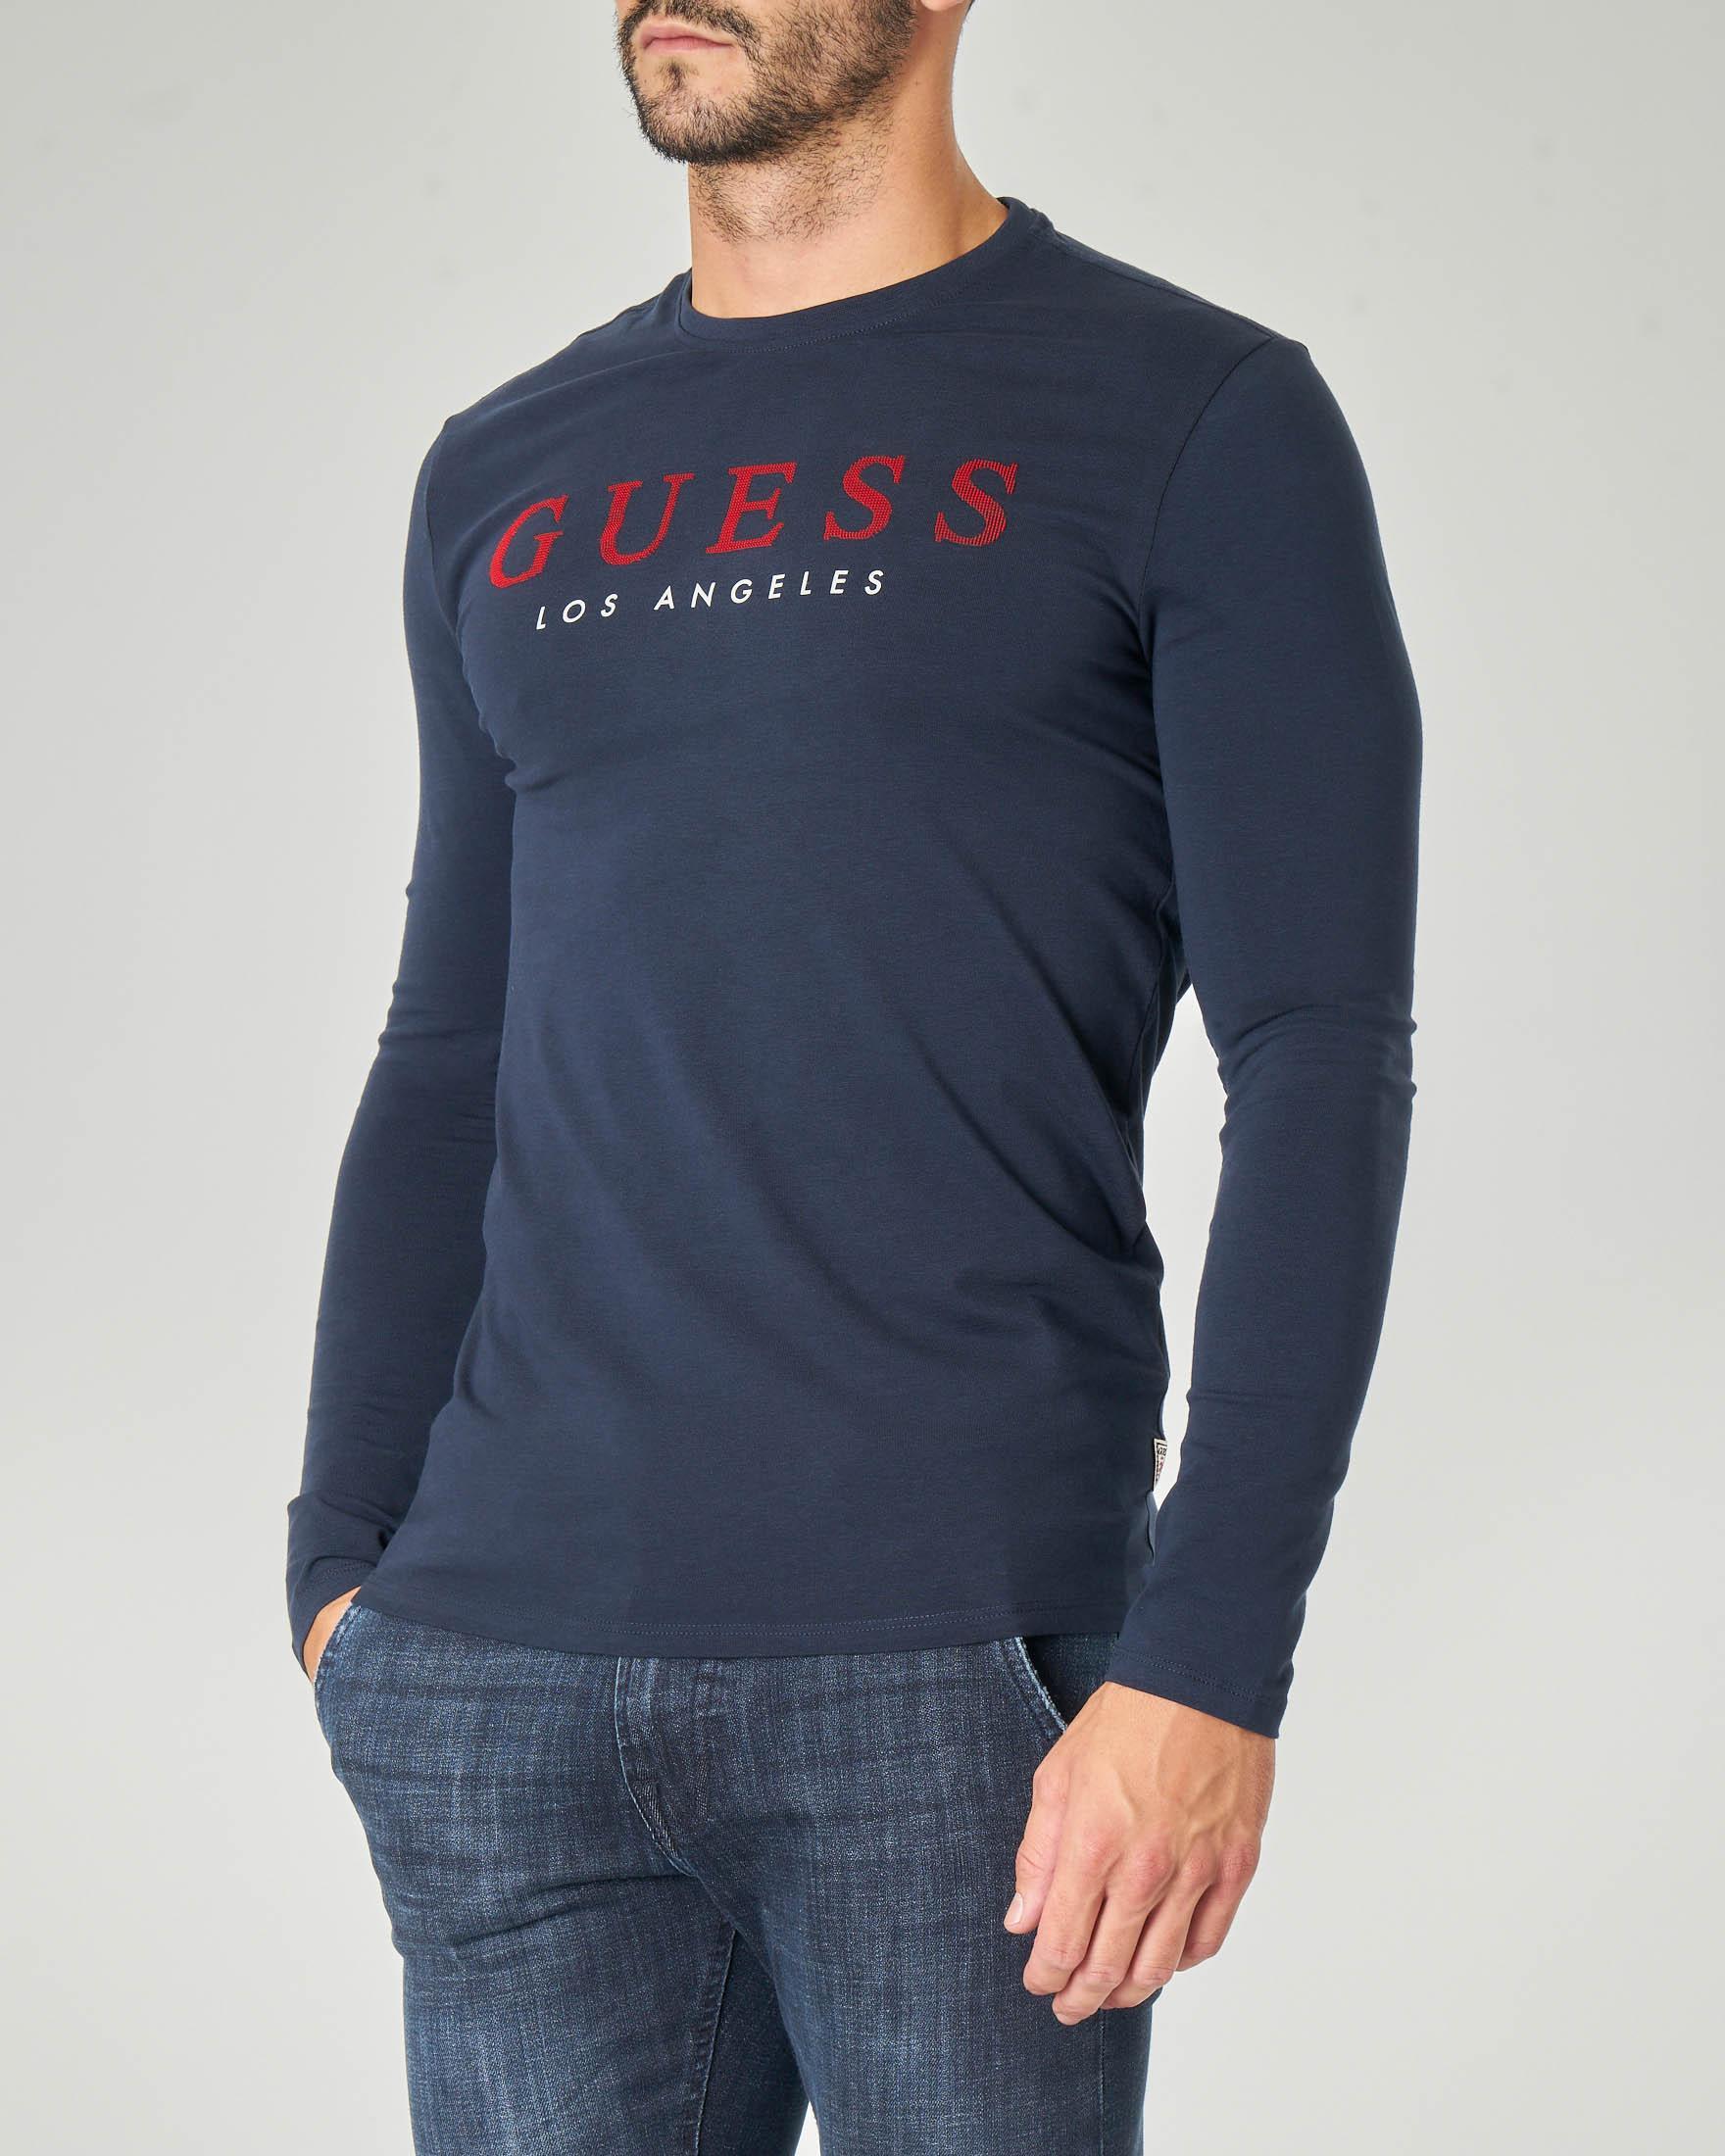 T-shirt blu manica lunga con logo rosso ricamato